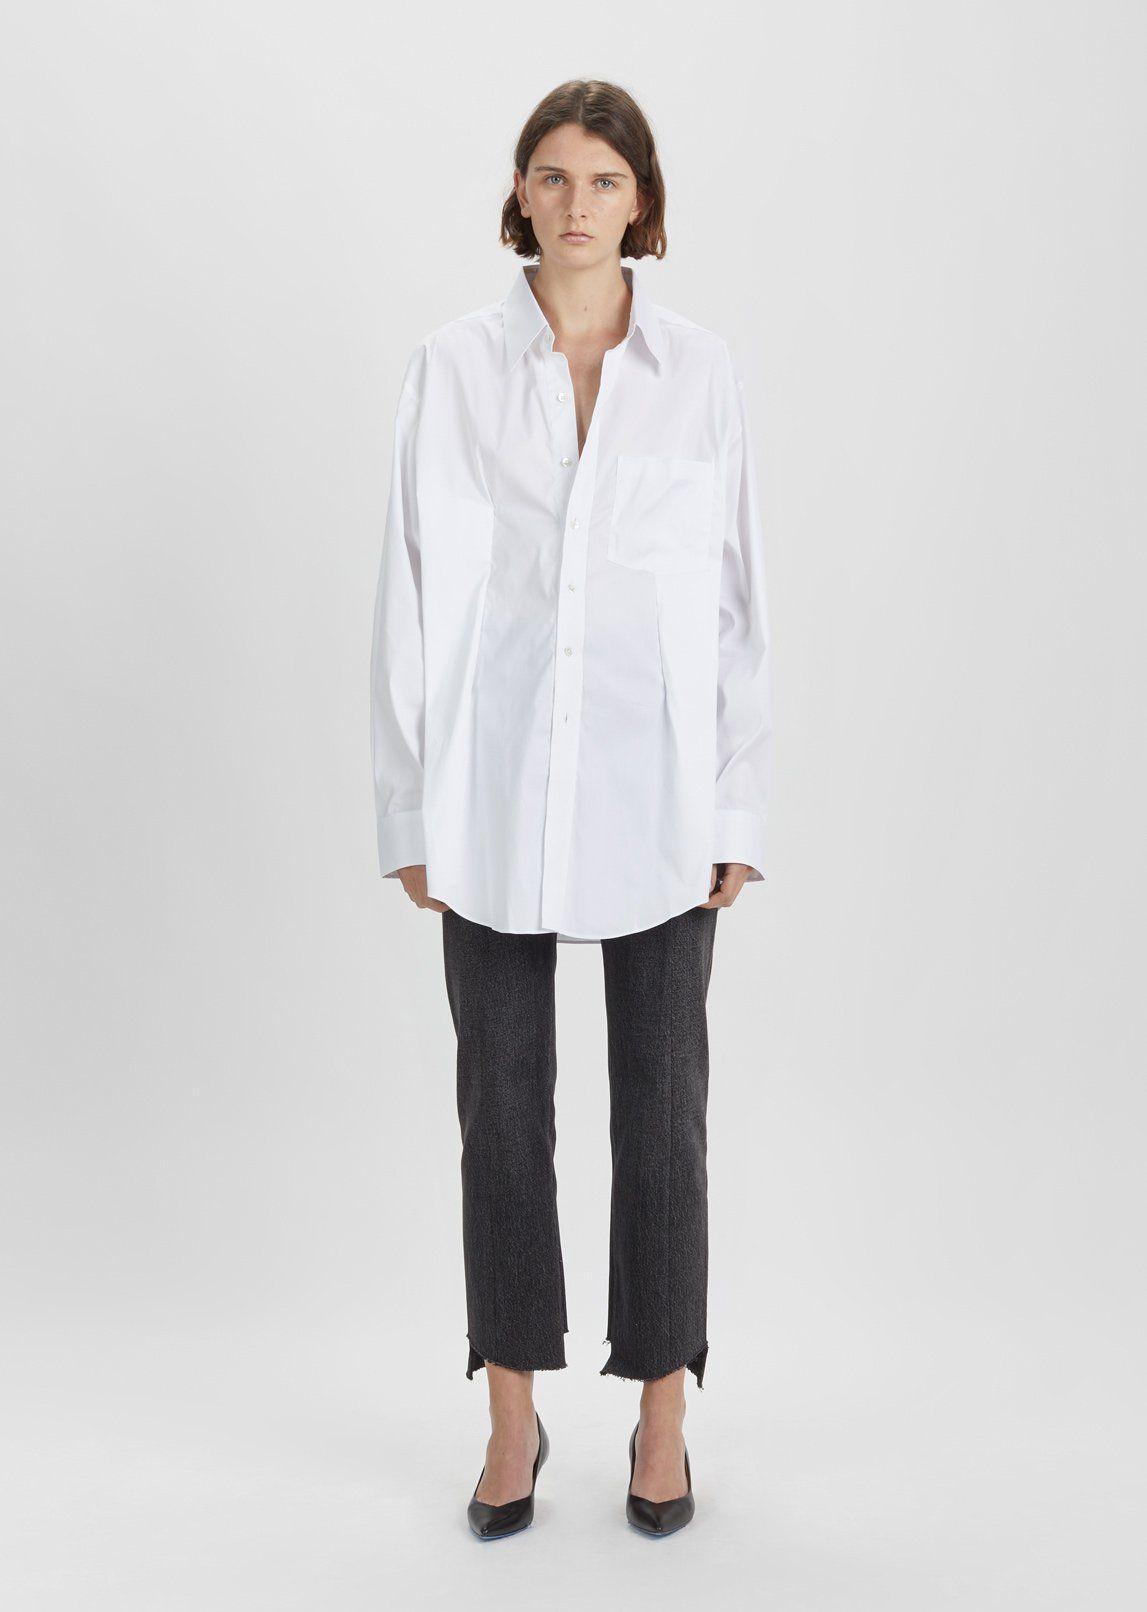 White Secretary Decollage Shirt VETEMENTS Cheap Sale Official Sale Best Sale Sale Countdown Package Outlet Hot Sale Cheap Sneakernews rJqcyE